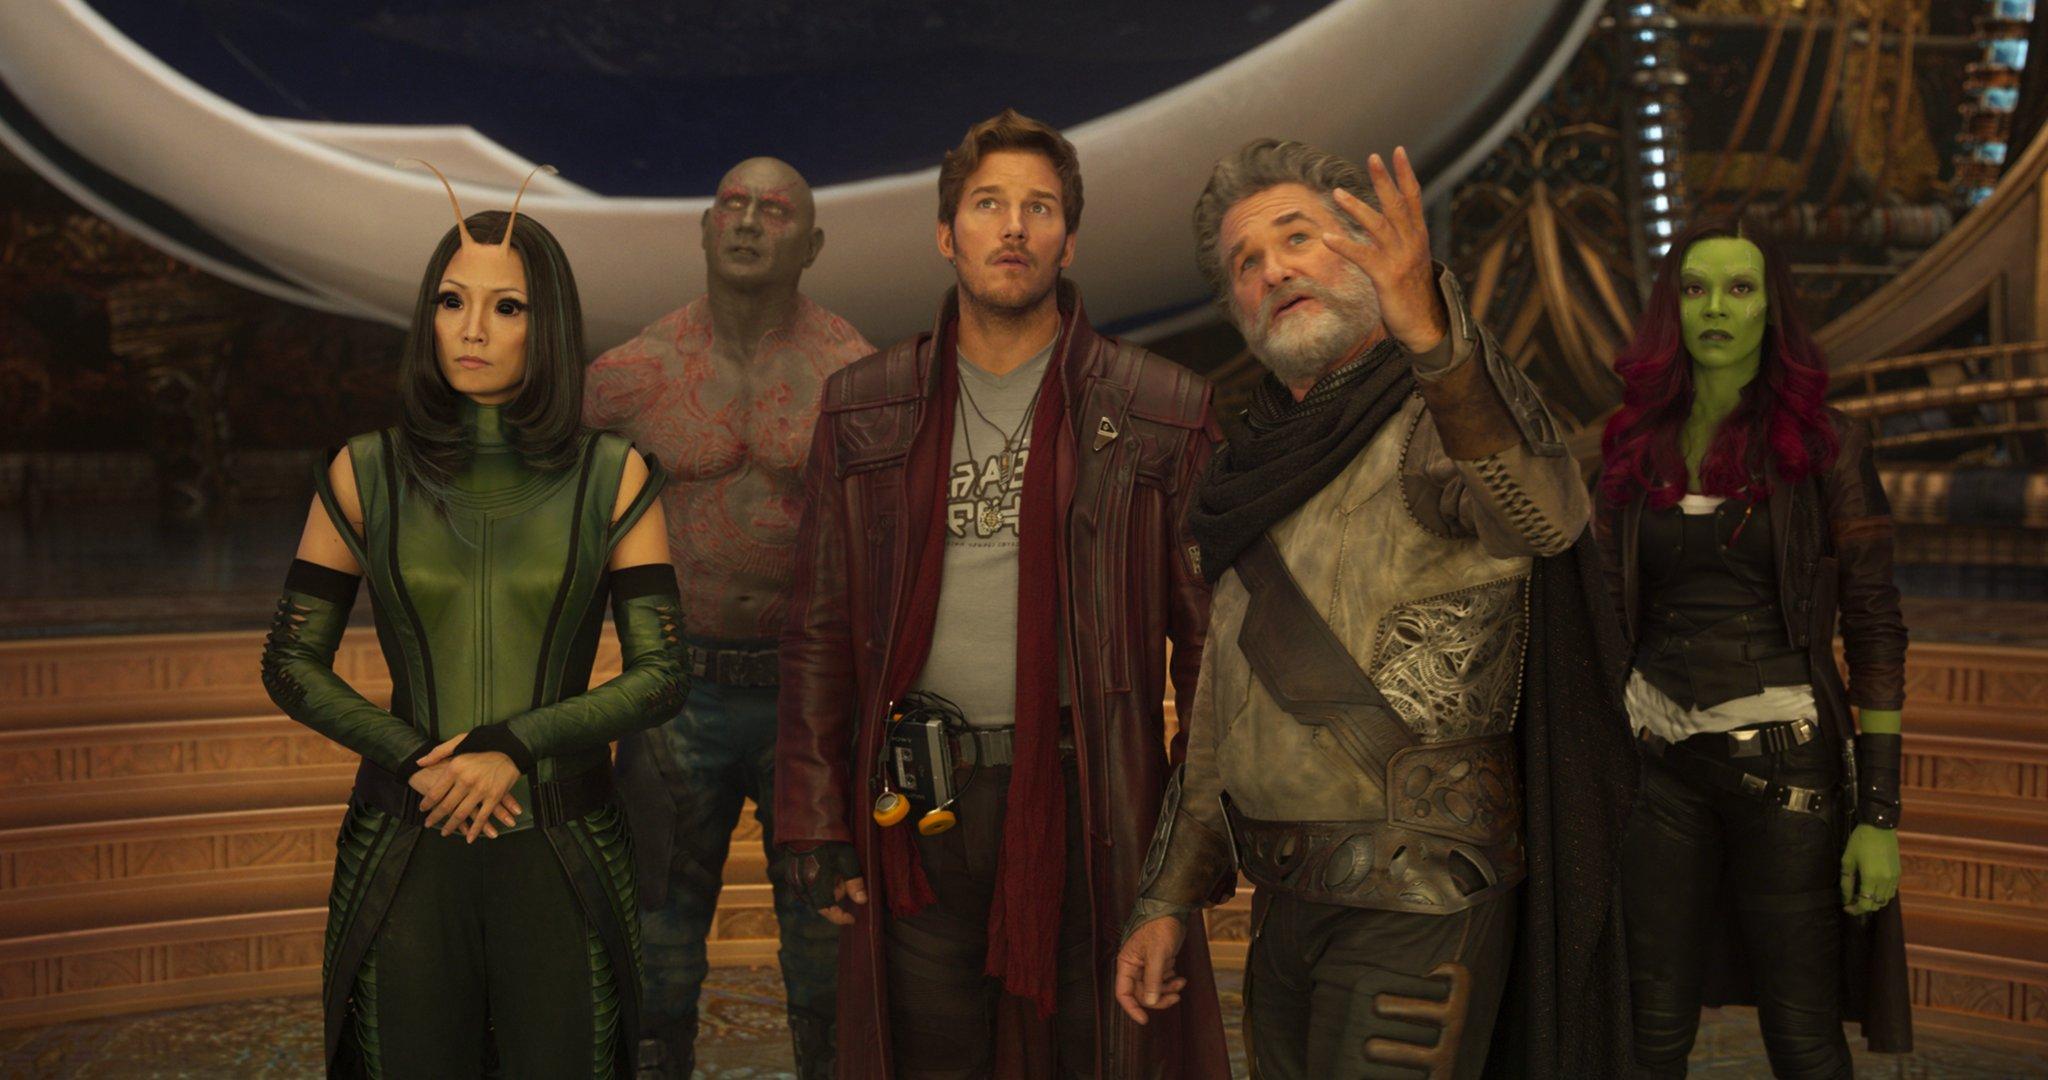 Mantis (Pom Klementieff), Drax (Dave Bautista), Ego (Kurt Russell), Peter Quill (Chris Pratt) and Gamora (Zoe Saldana) in Guardians of the Galaxy Vol 2 (2017)